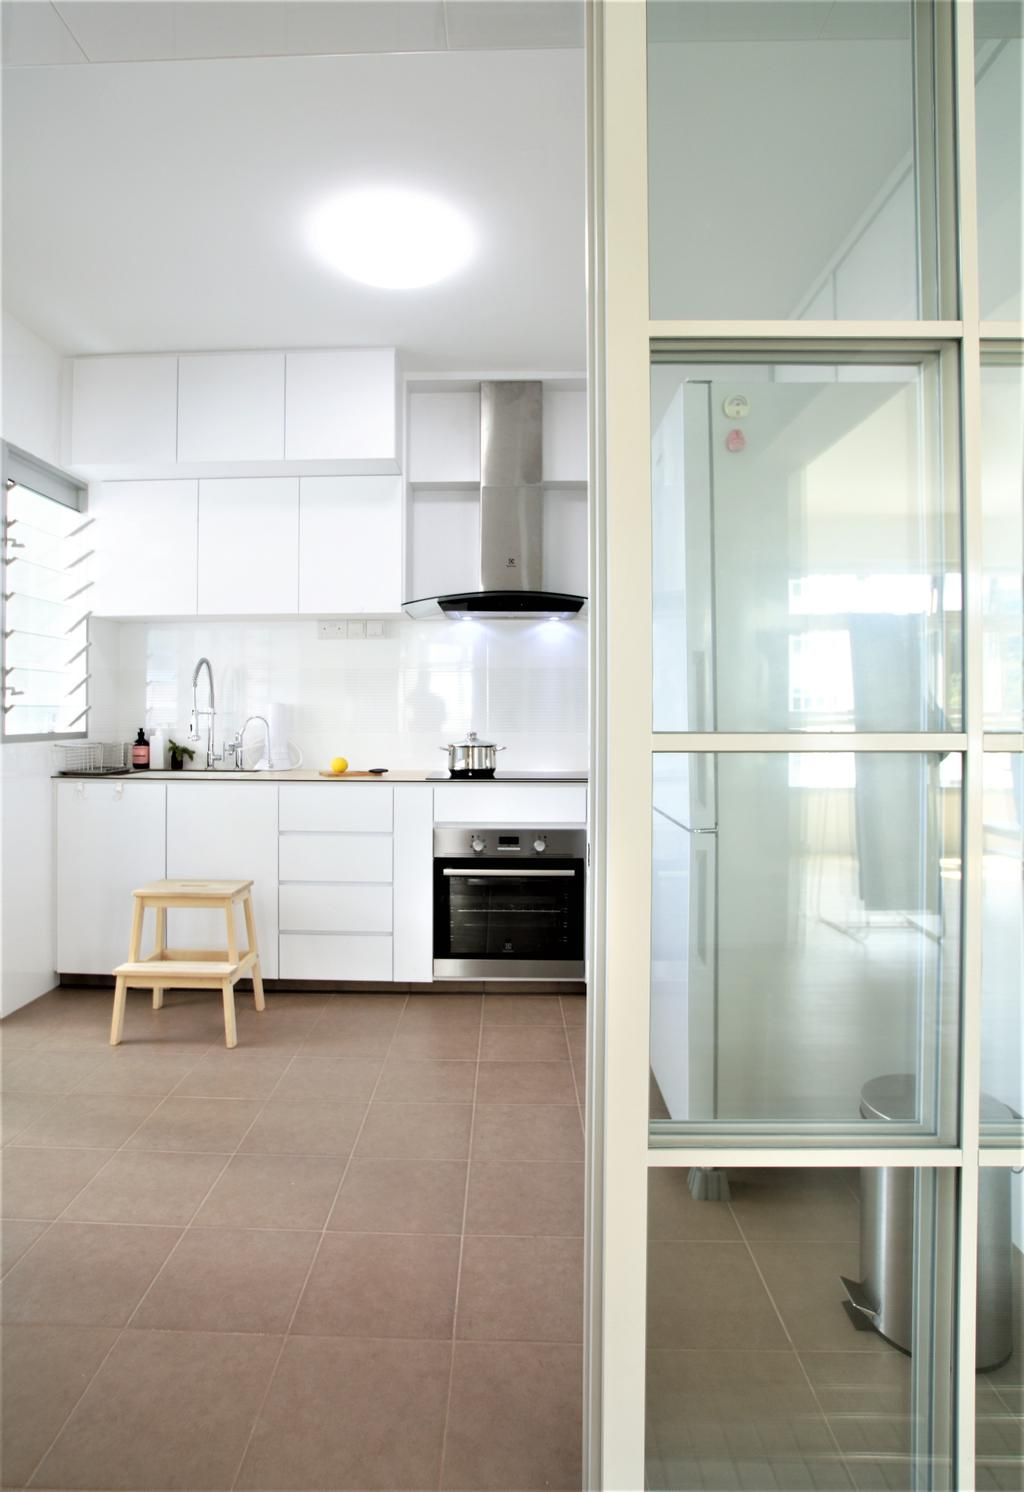 HDB, Telok Blangah, Interior Designer, Intrigue-d Design Consultancy, Indoors, Interior Design, Kitchen, Room, Appliance, Electrical Device, Oven